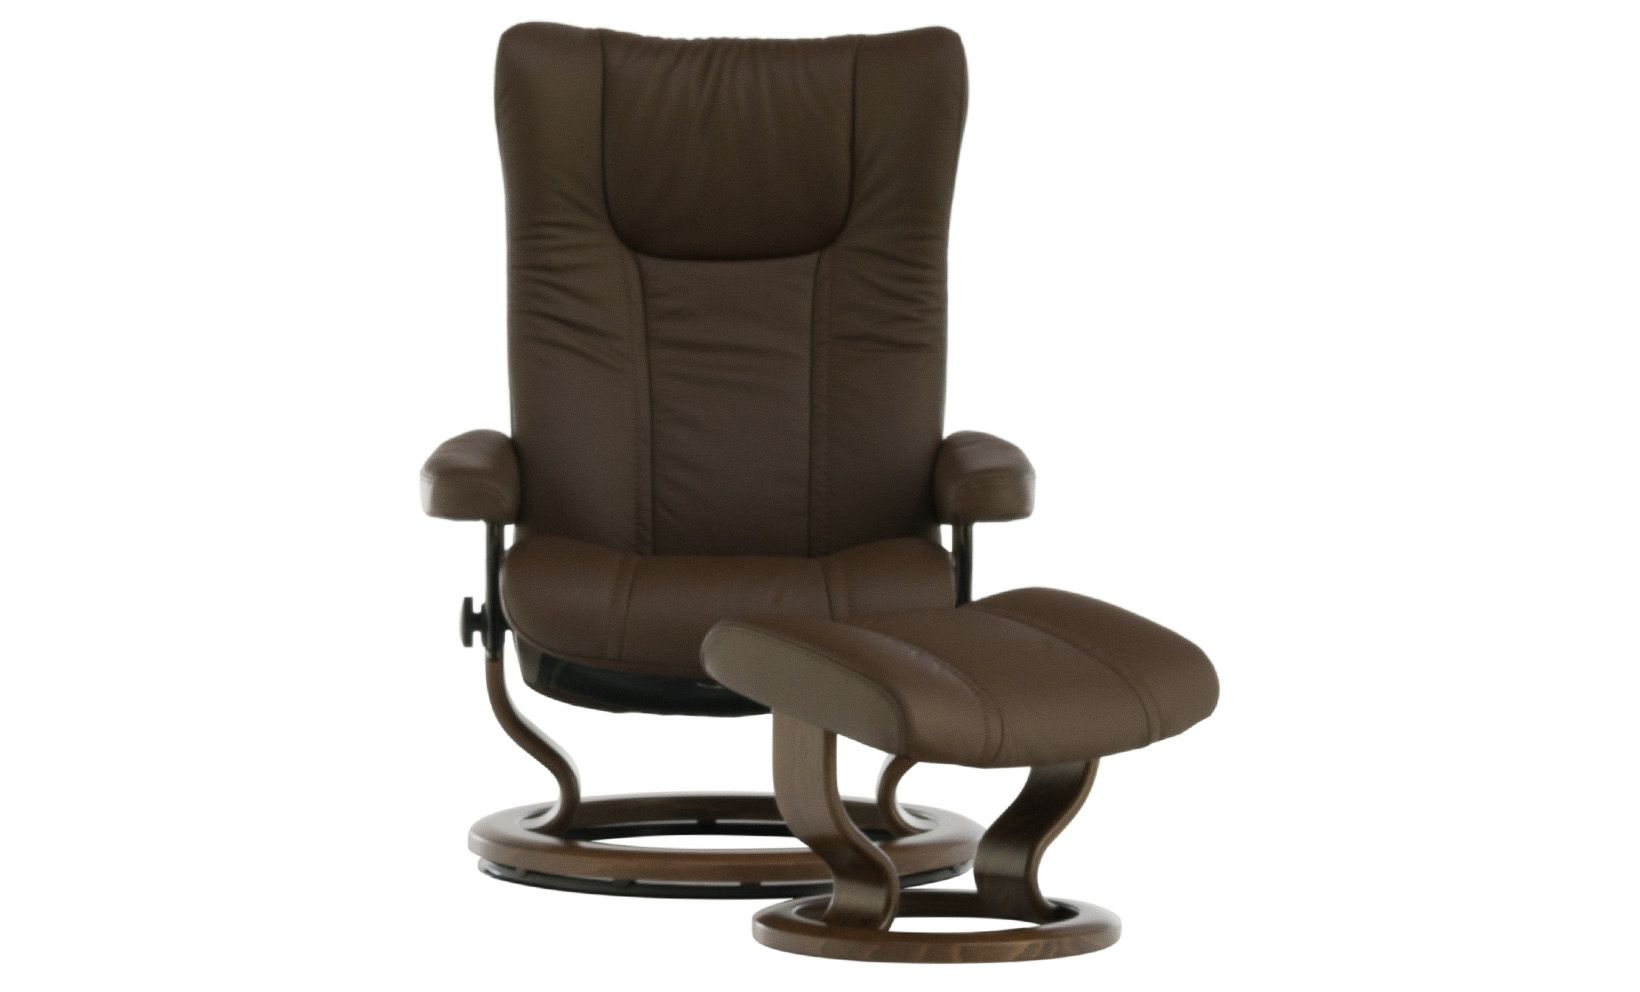 Park Art|My WordPress Blog_Comfortable Office Chair With Ottoman